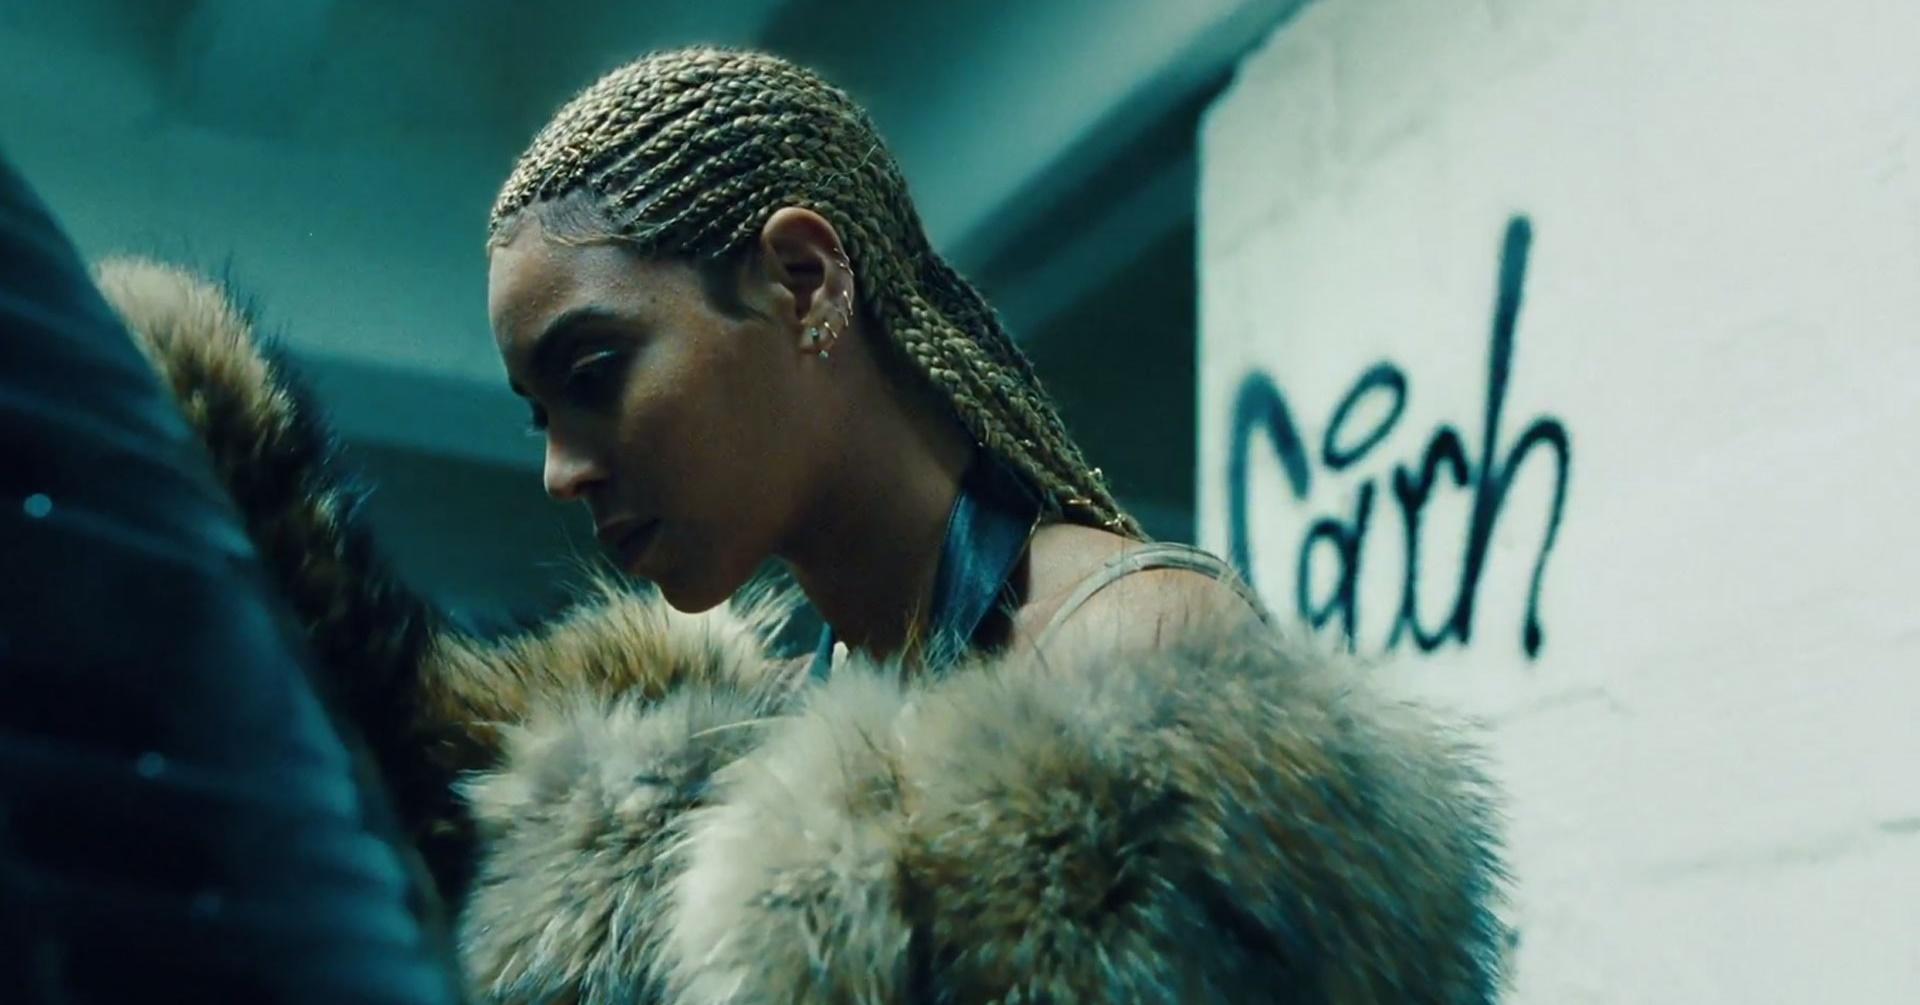 Finalmente! Álbum 'Lemonade', de Beyoncé, chegará às plataformas de streaming